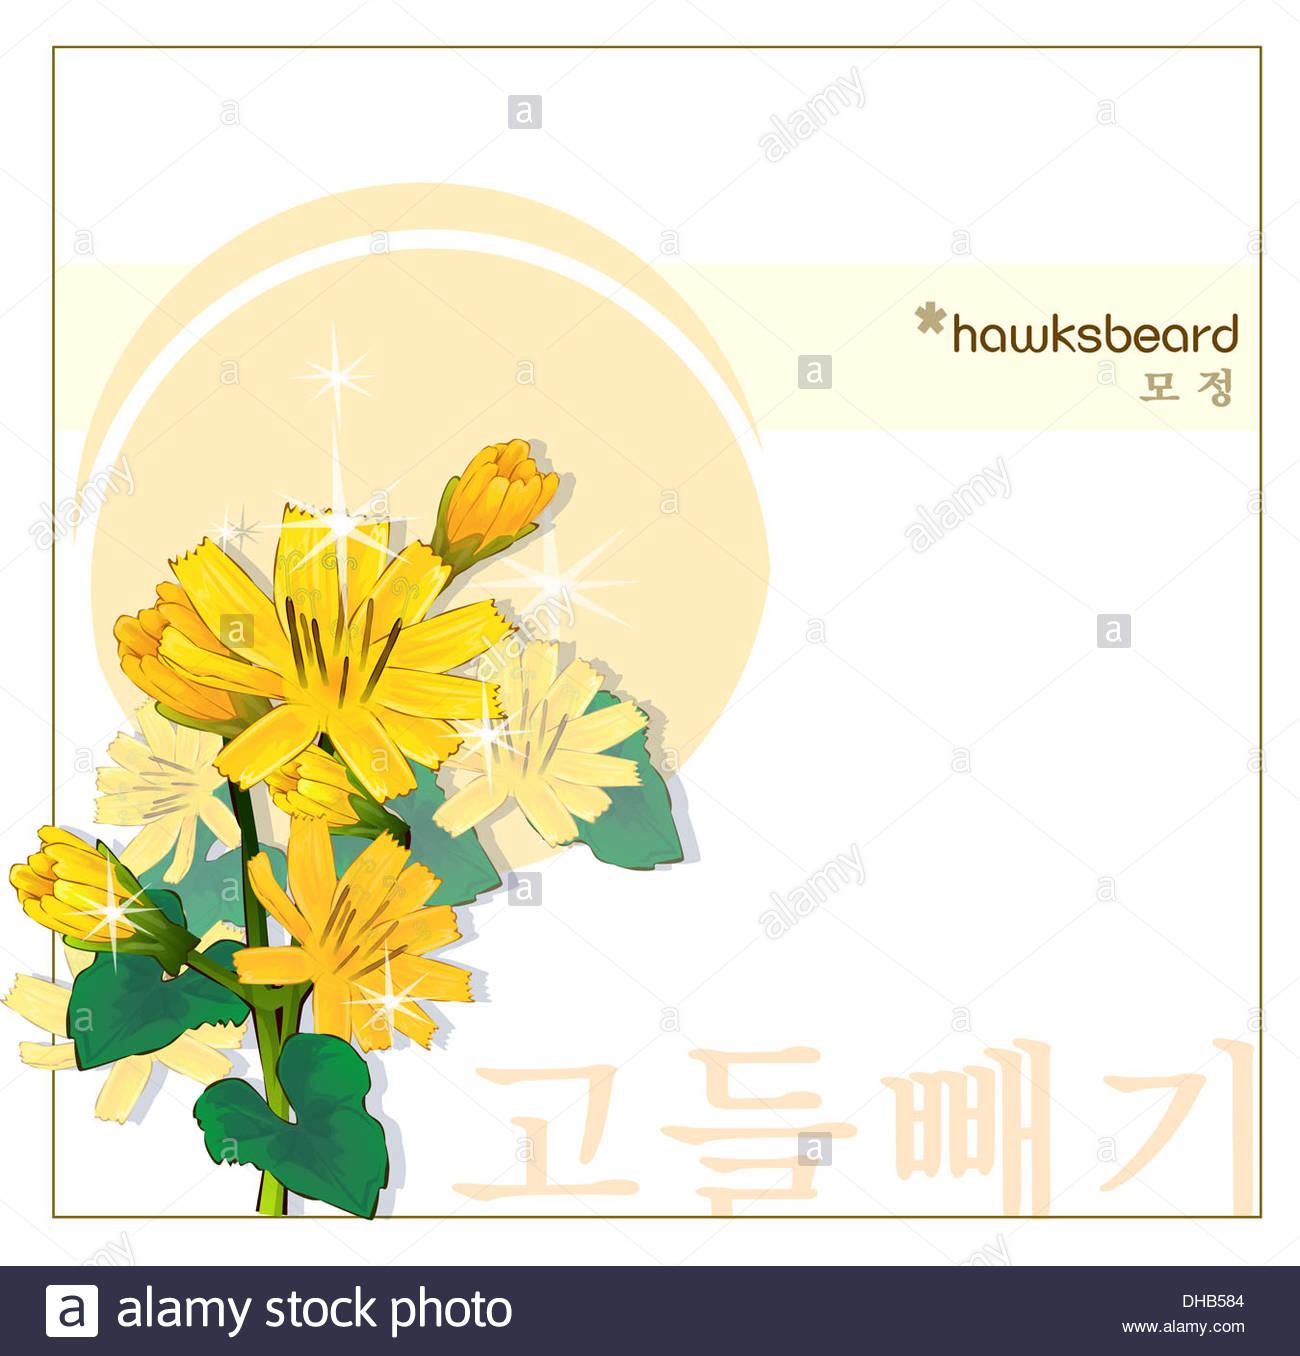 Korean Characters, Nature, Hawksbeard, Templet, Plant, Hangeul.